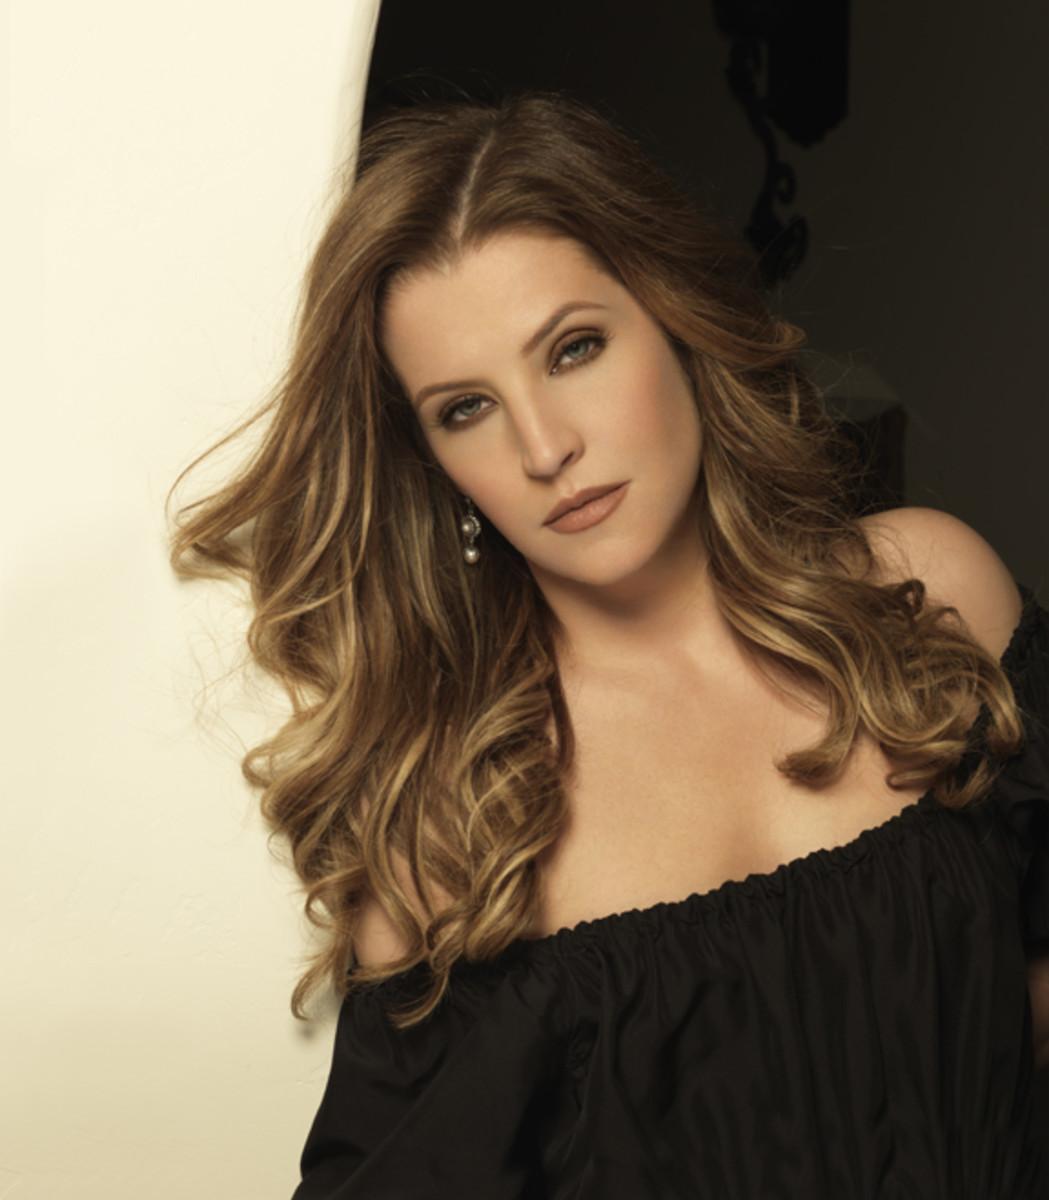 Lisa Marie Presley photo by Kevin Hees